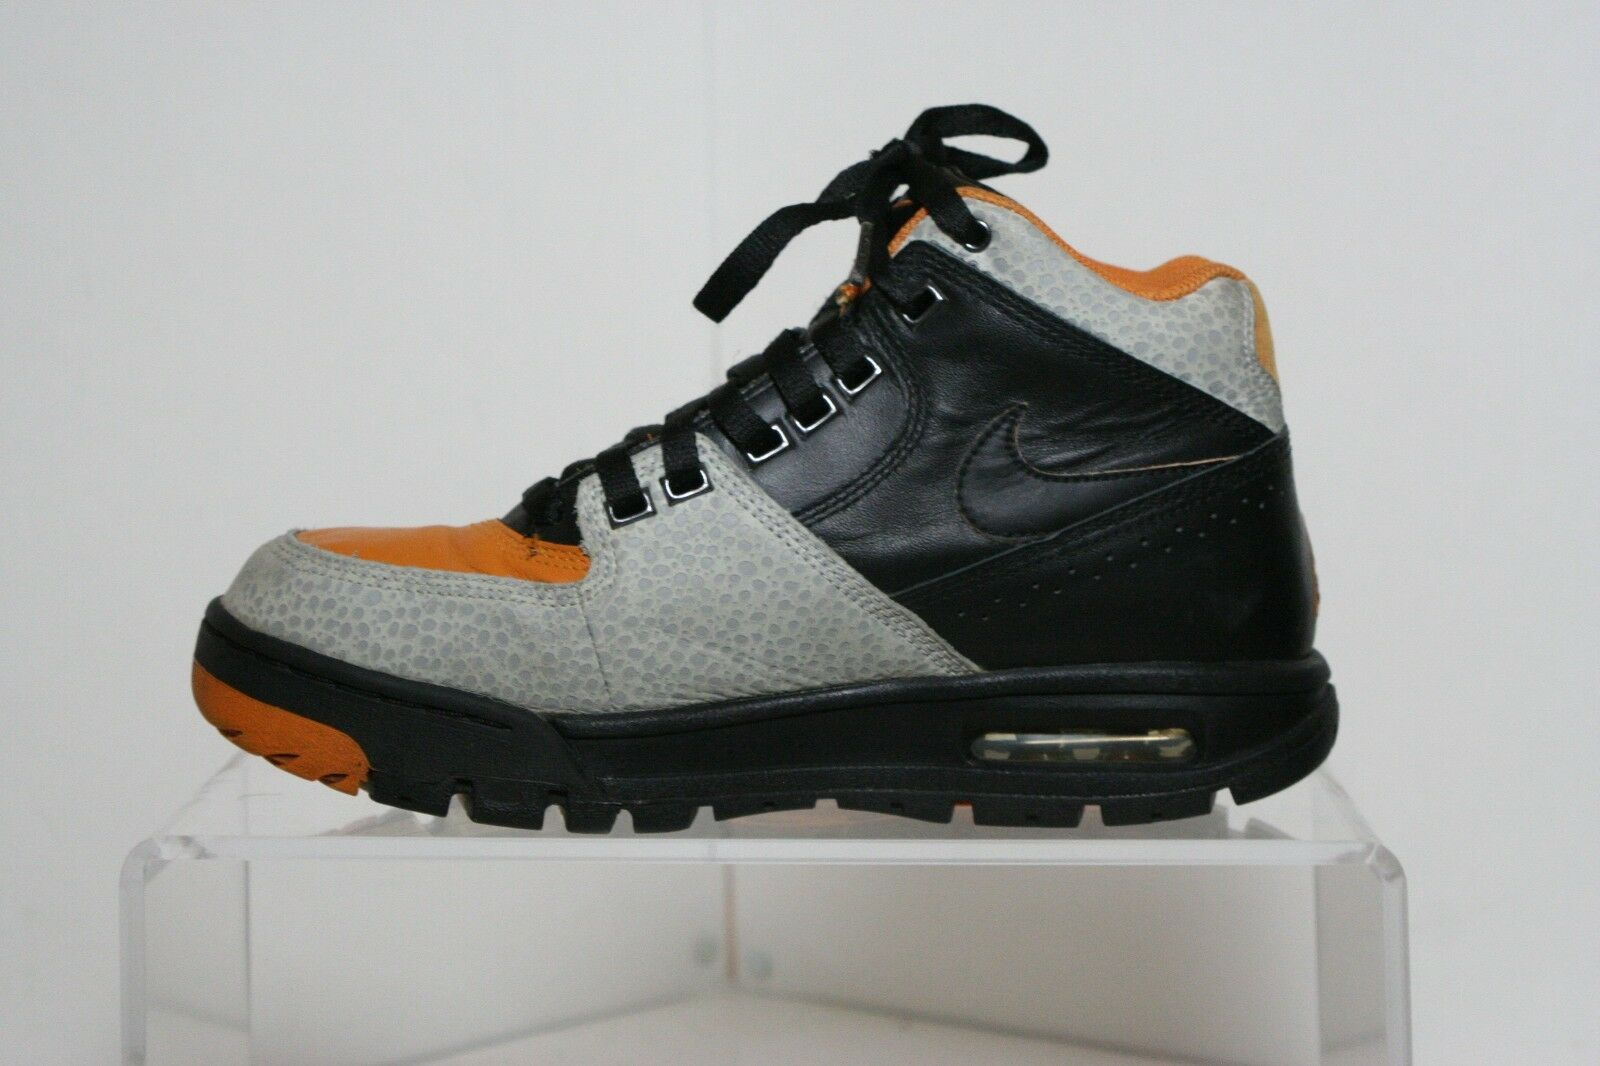 340bb8225e89 ... Nike Air Max Worknesh Worknesh Worknesh VTG 2009 High Men 8 Multi  Orange Cement Black Athletic ...